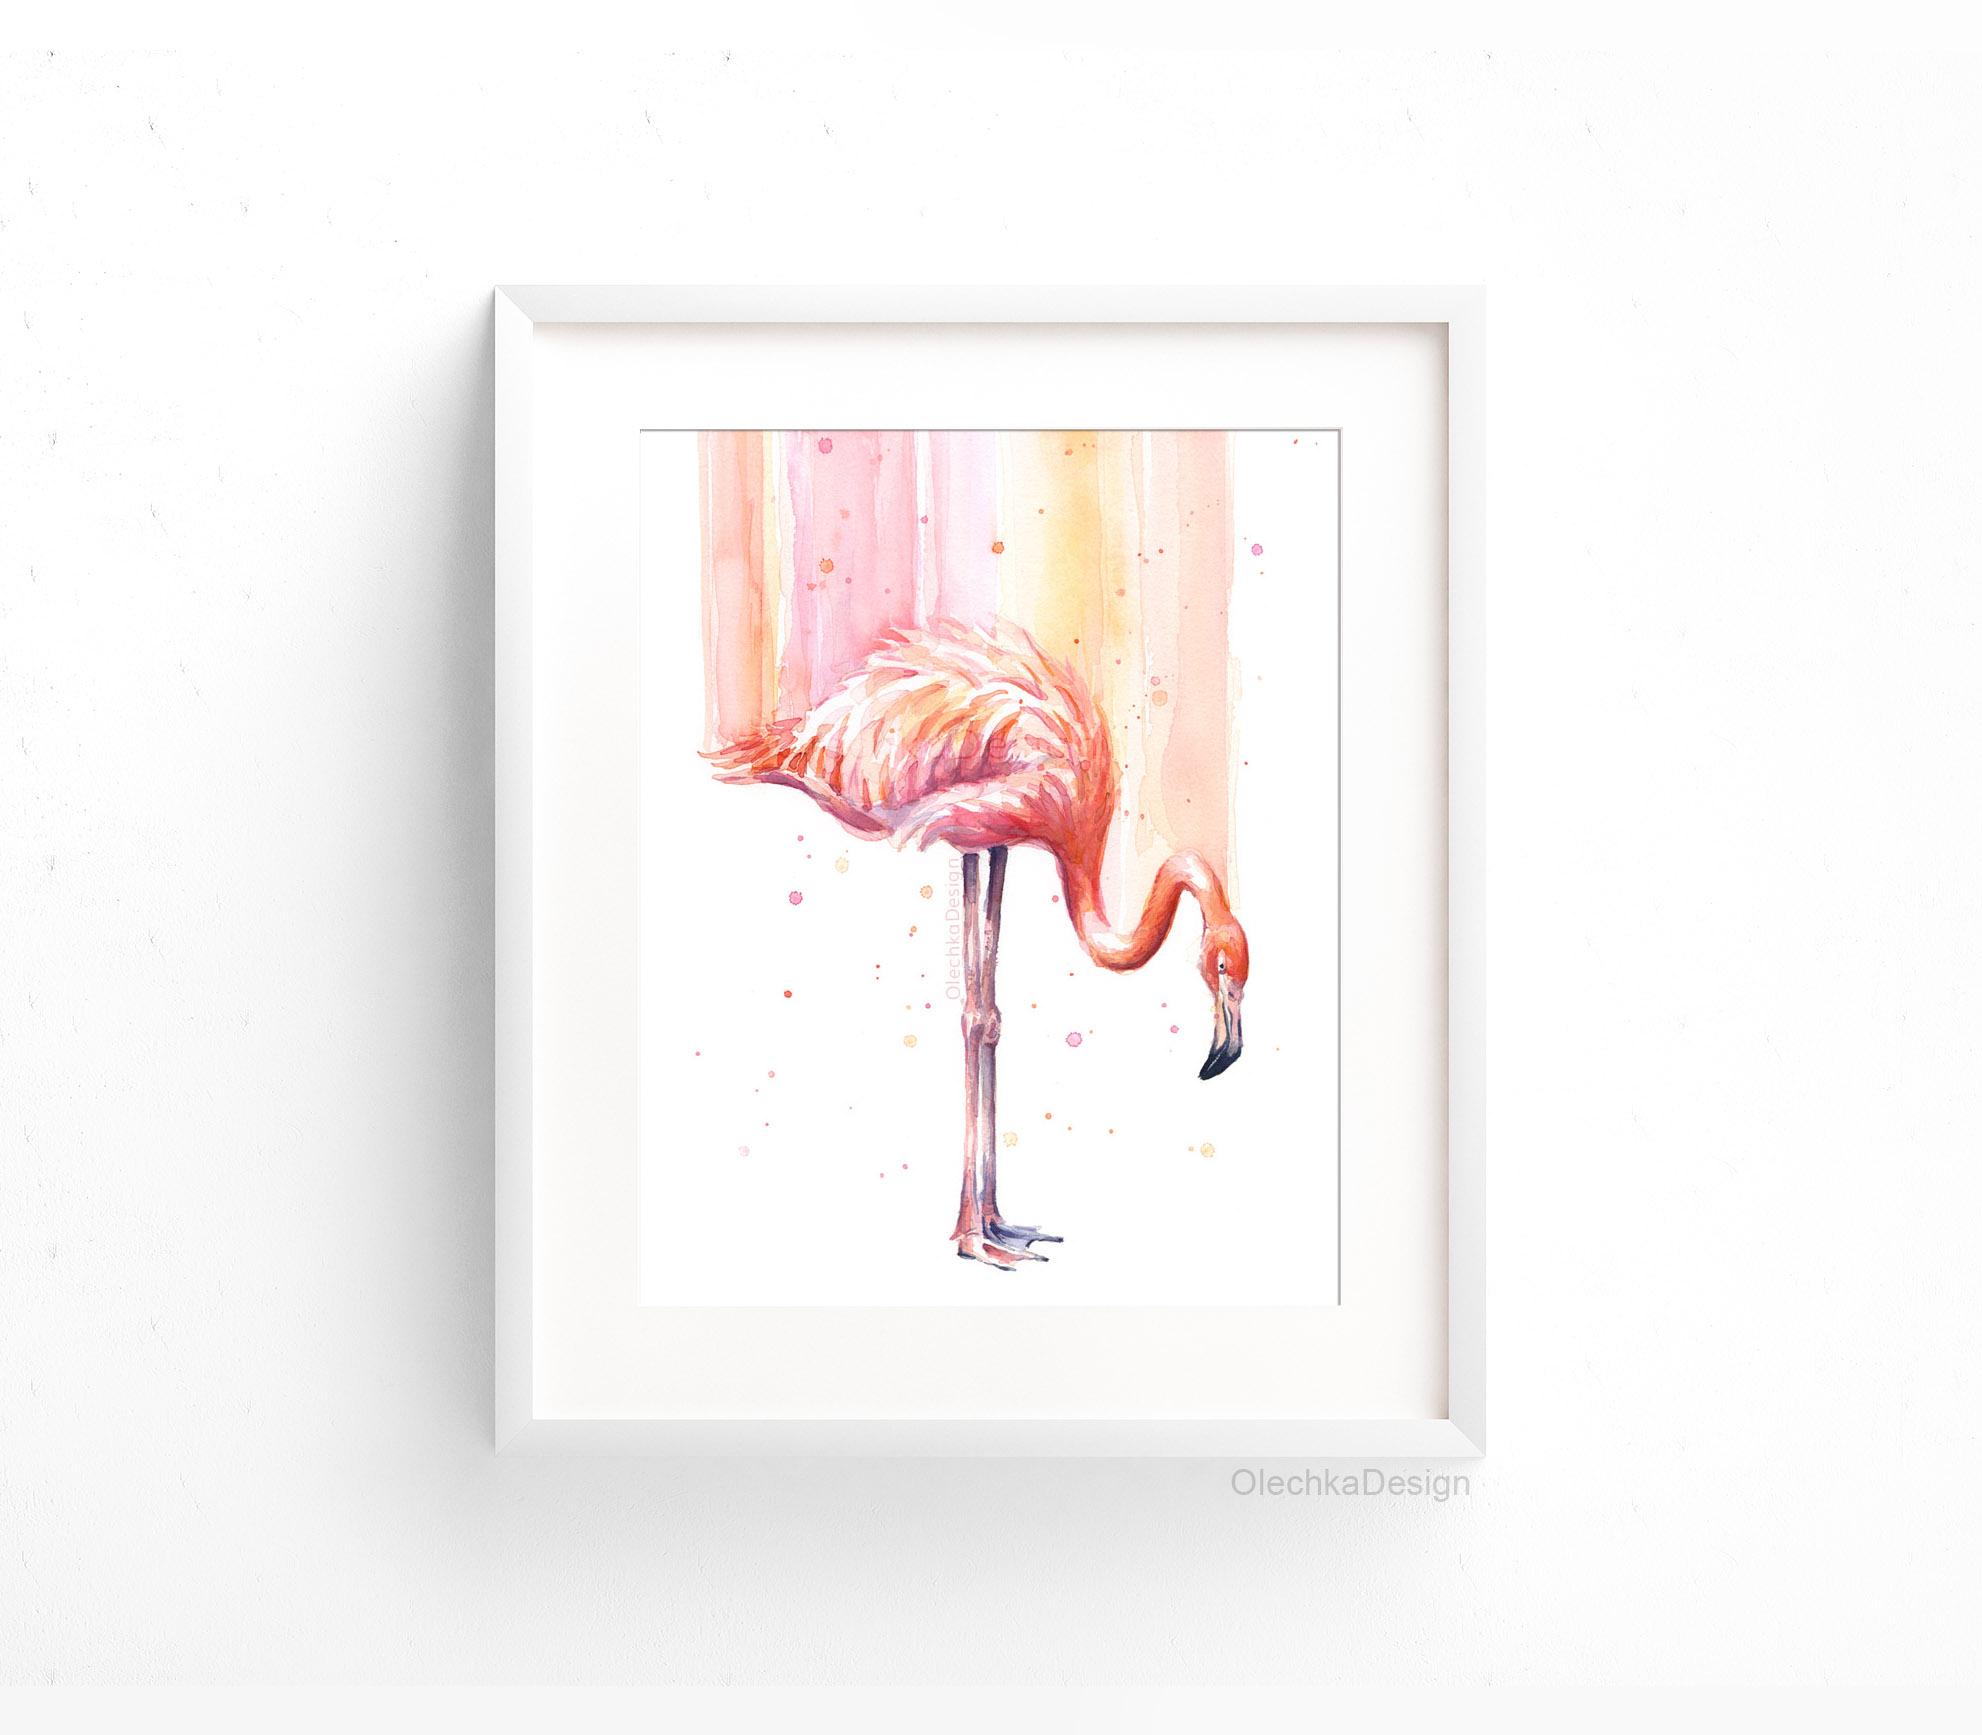 flamingo-watercolor-pink-art-pint-framed.jpg